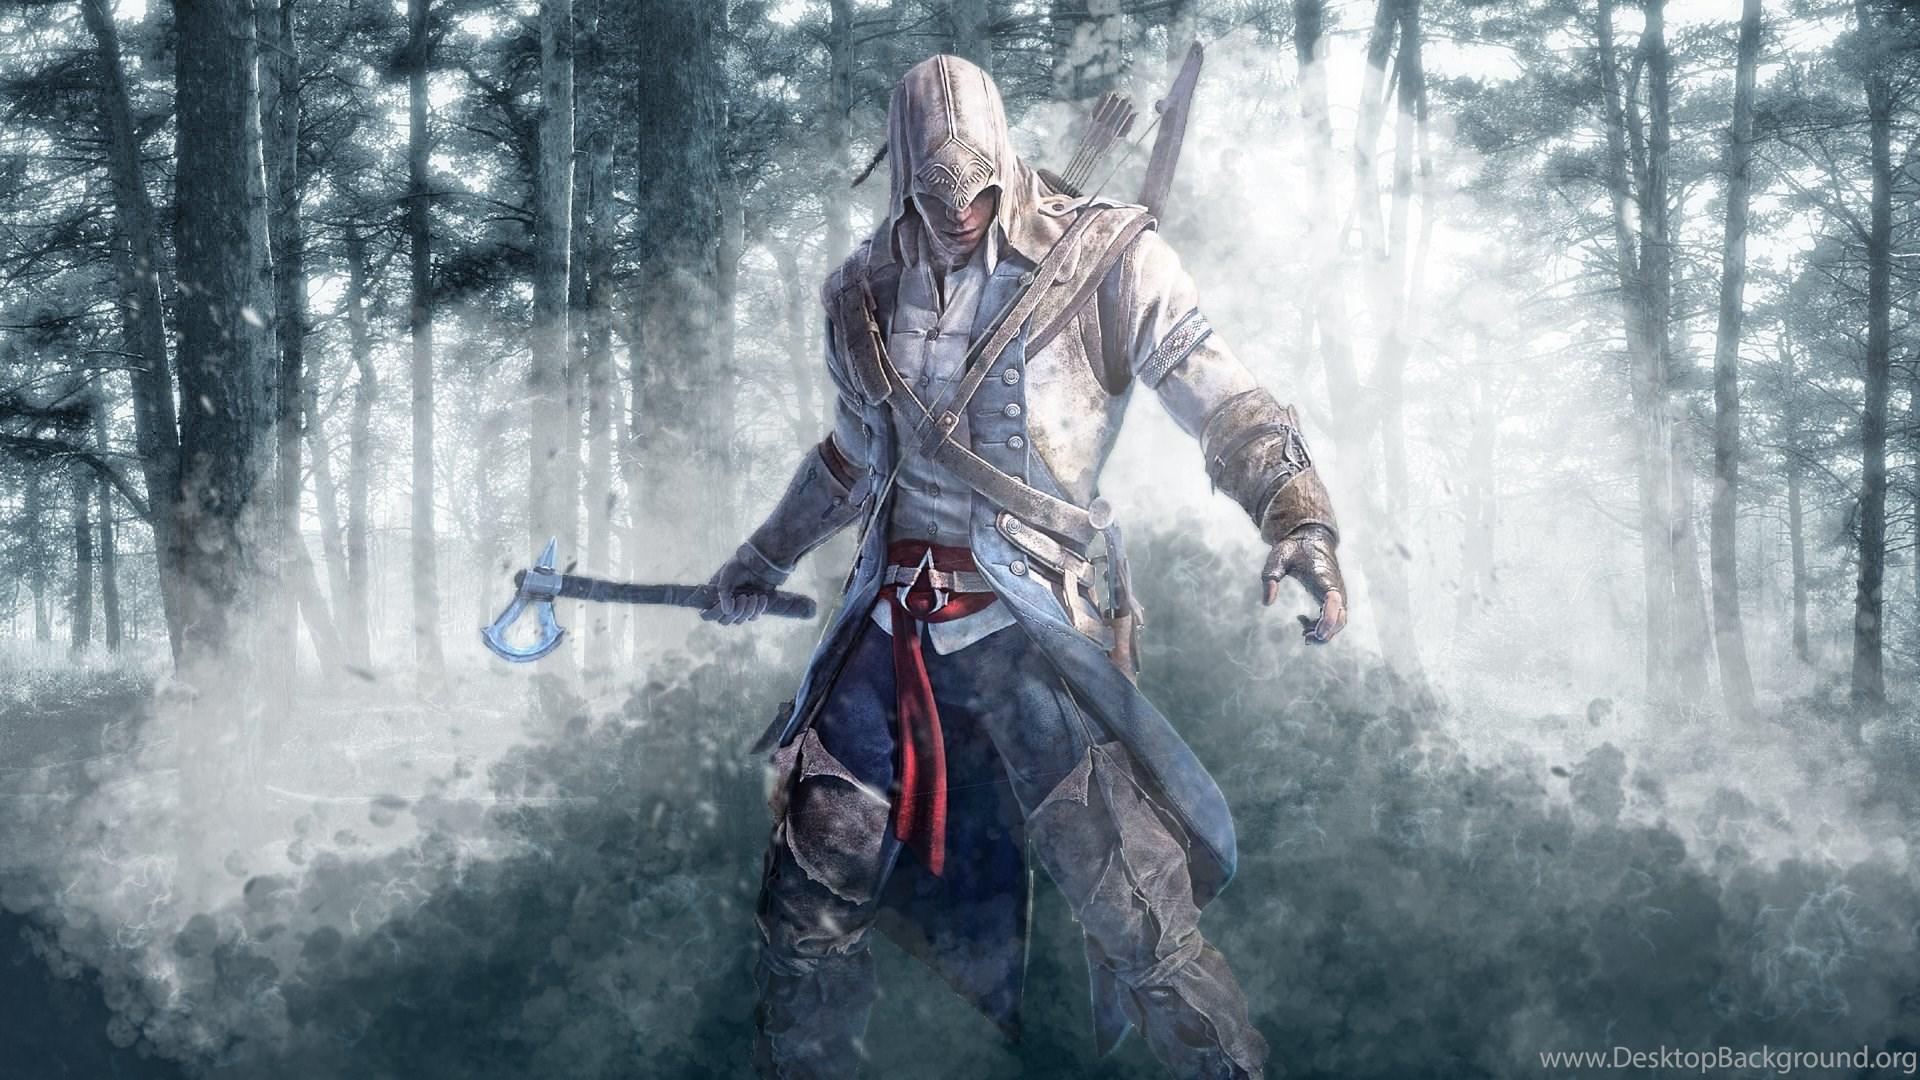 Assassins creed 3 wallpaper desktop background popular voltagebd Choice Image